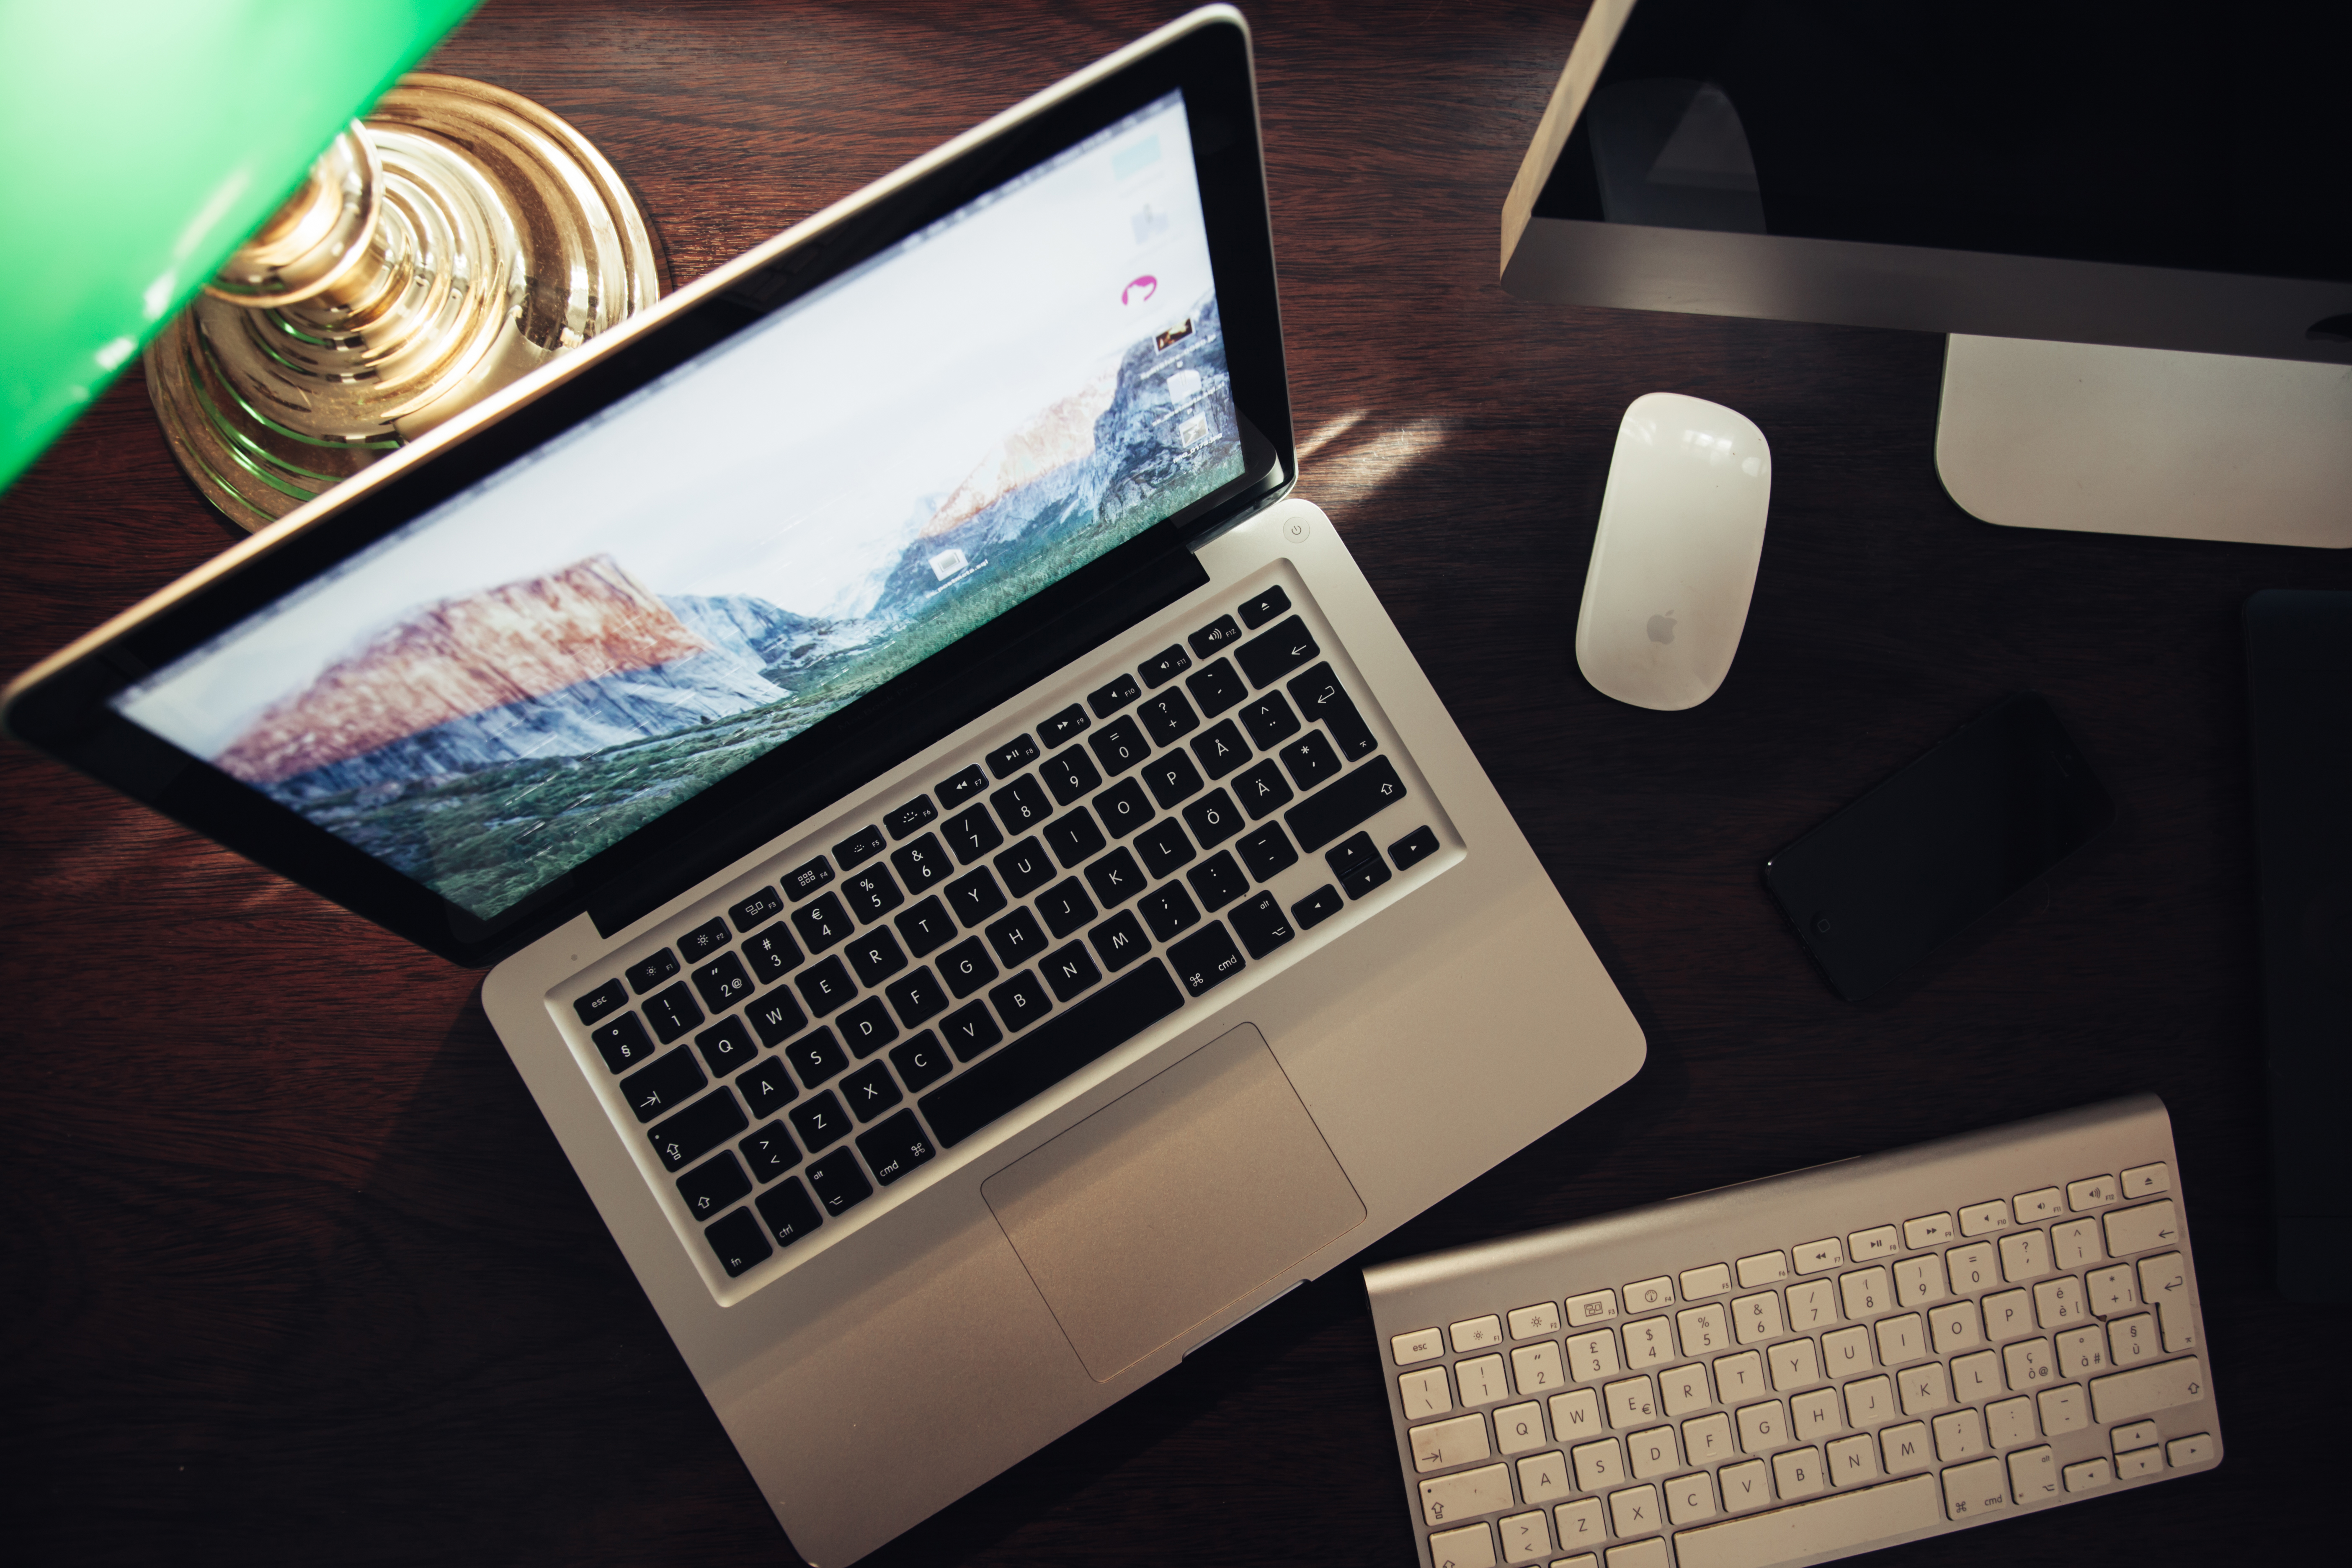 SiM 5 ordinateur article SplitShire-0214